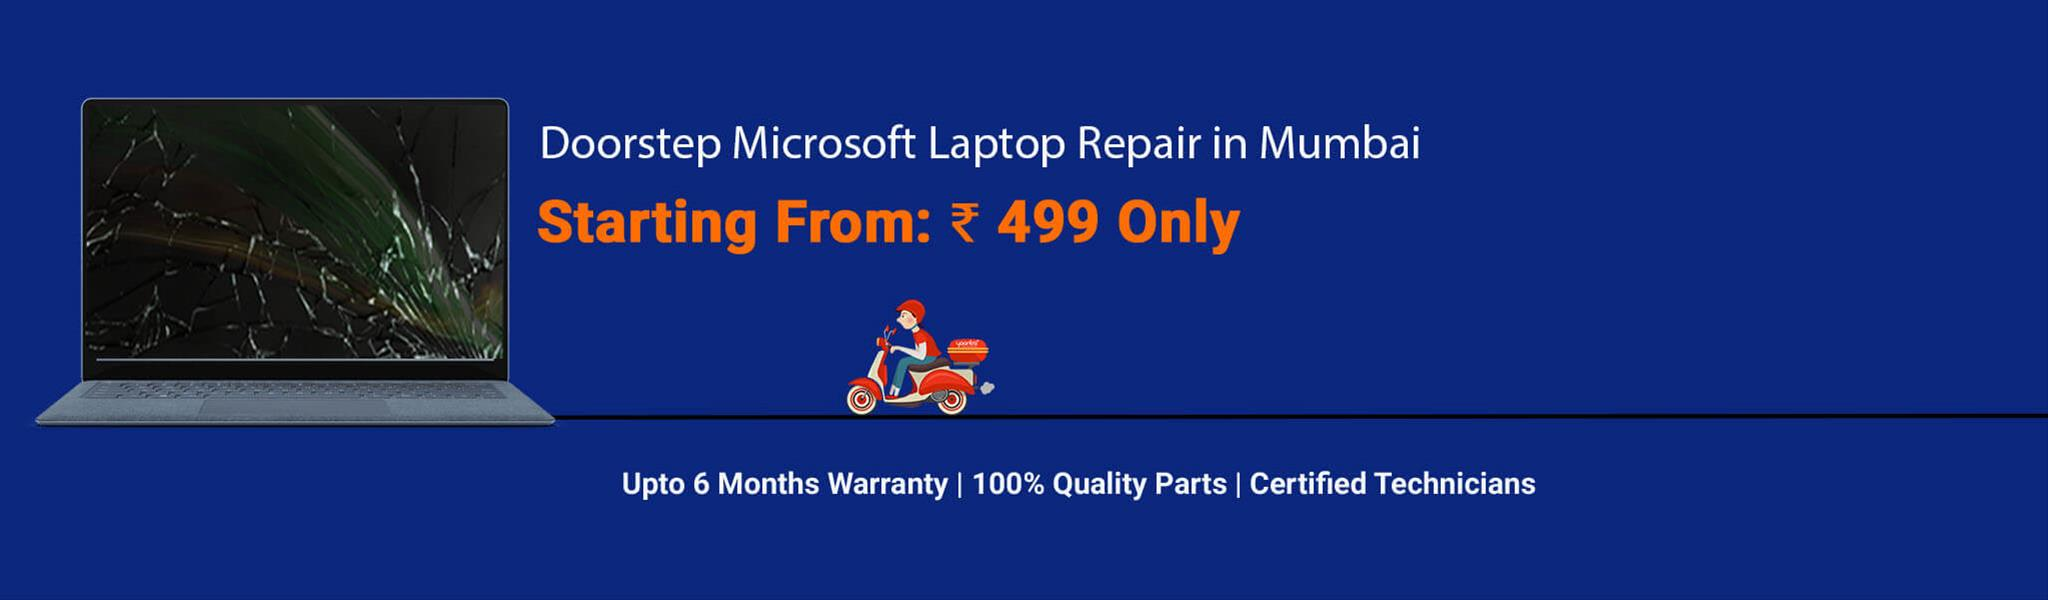 Microsoft-laptop-banner-mumbai.jpg